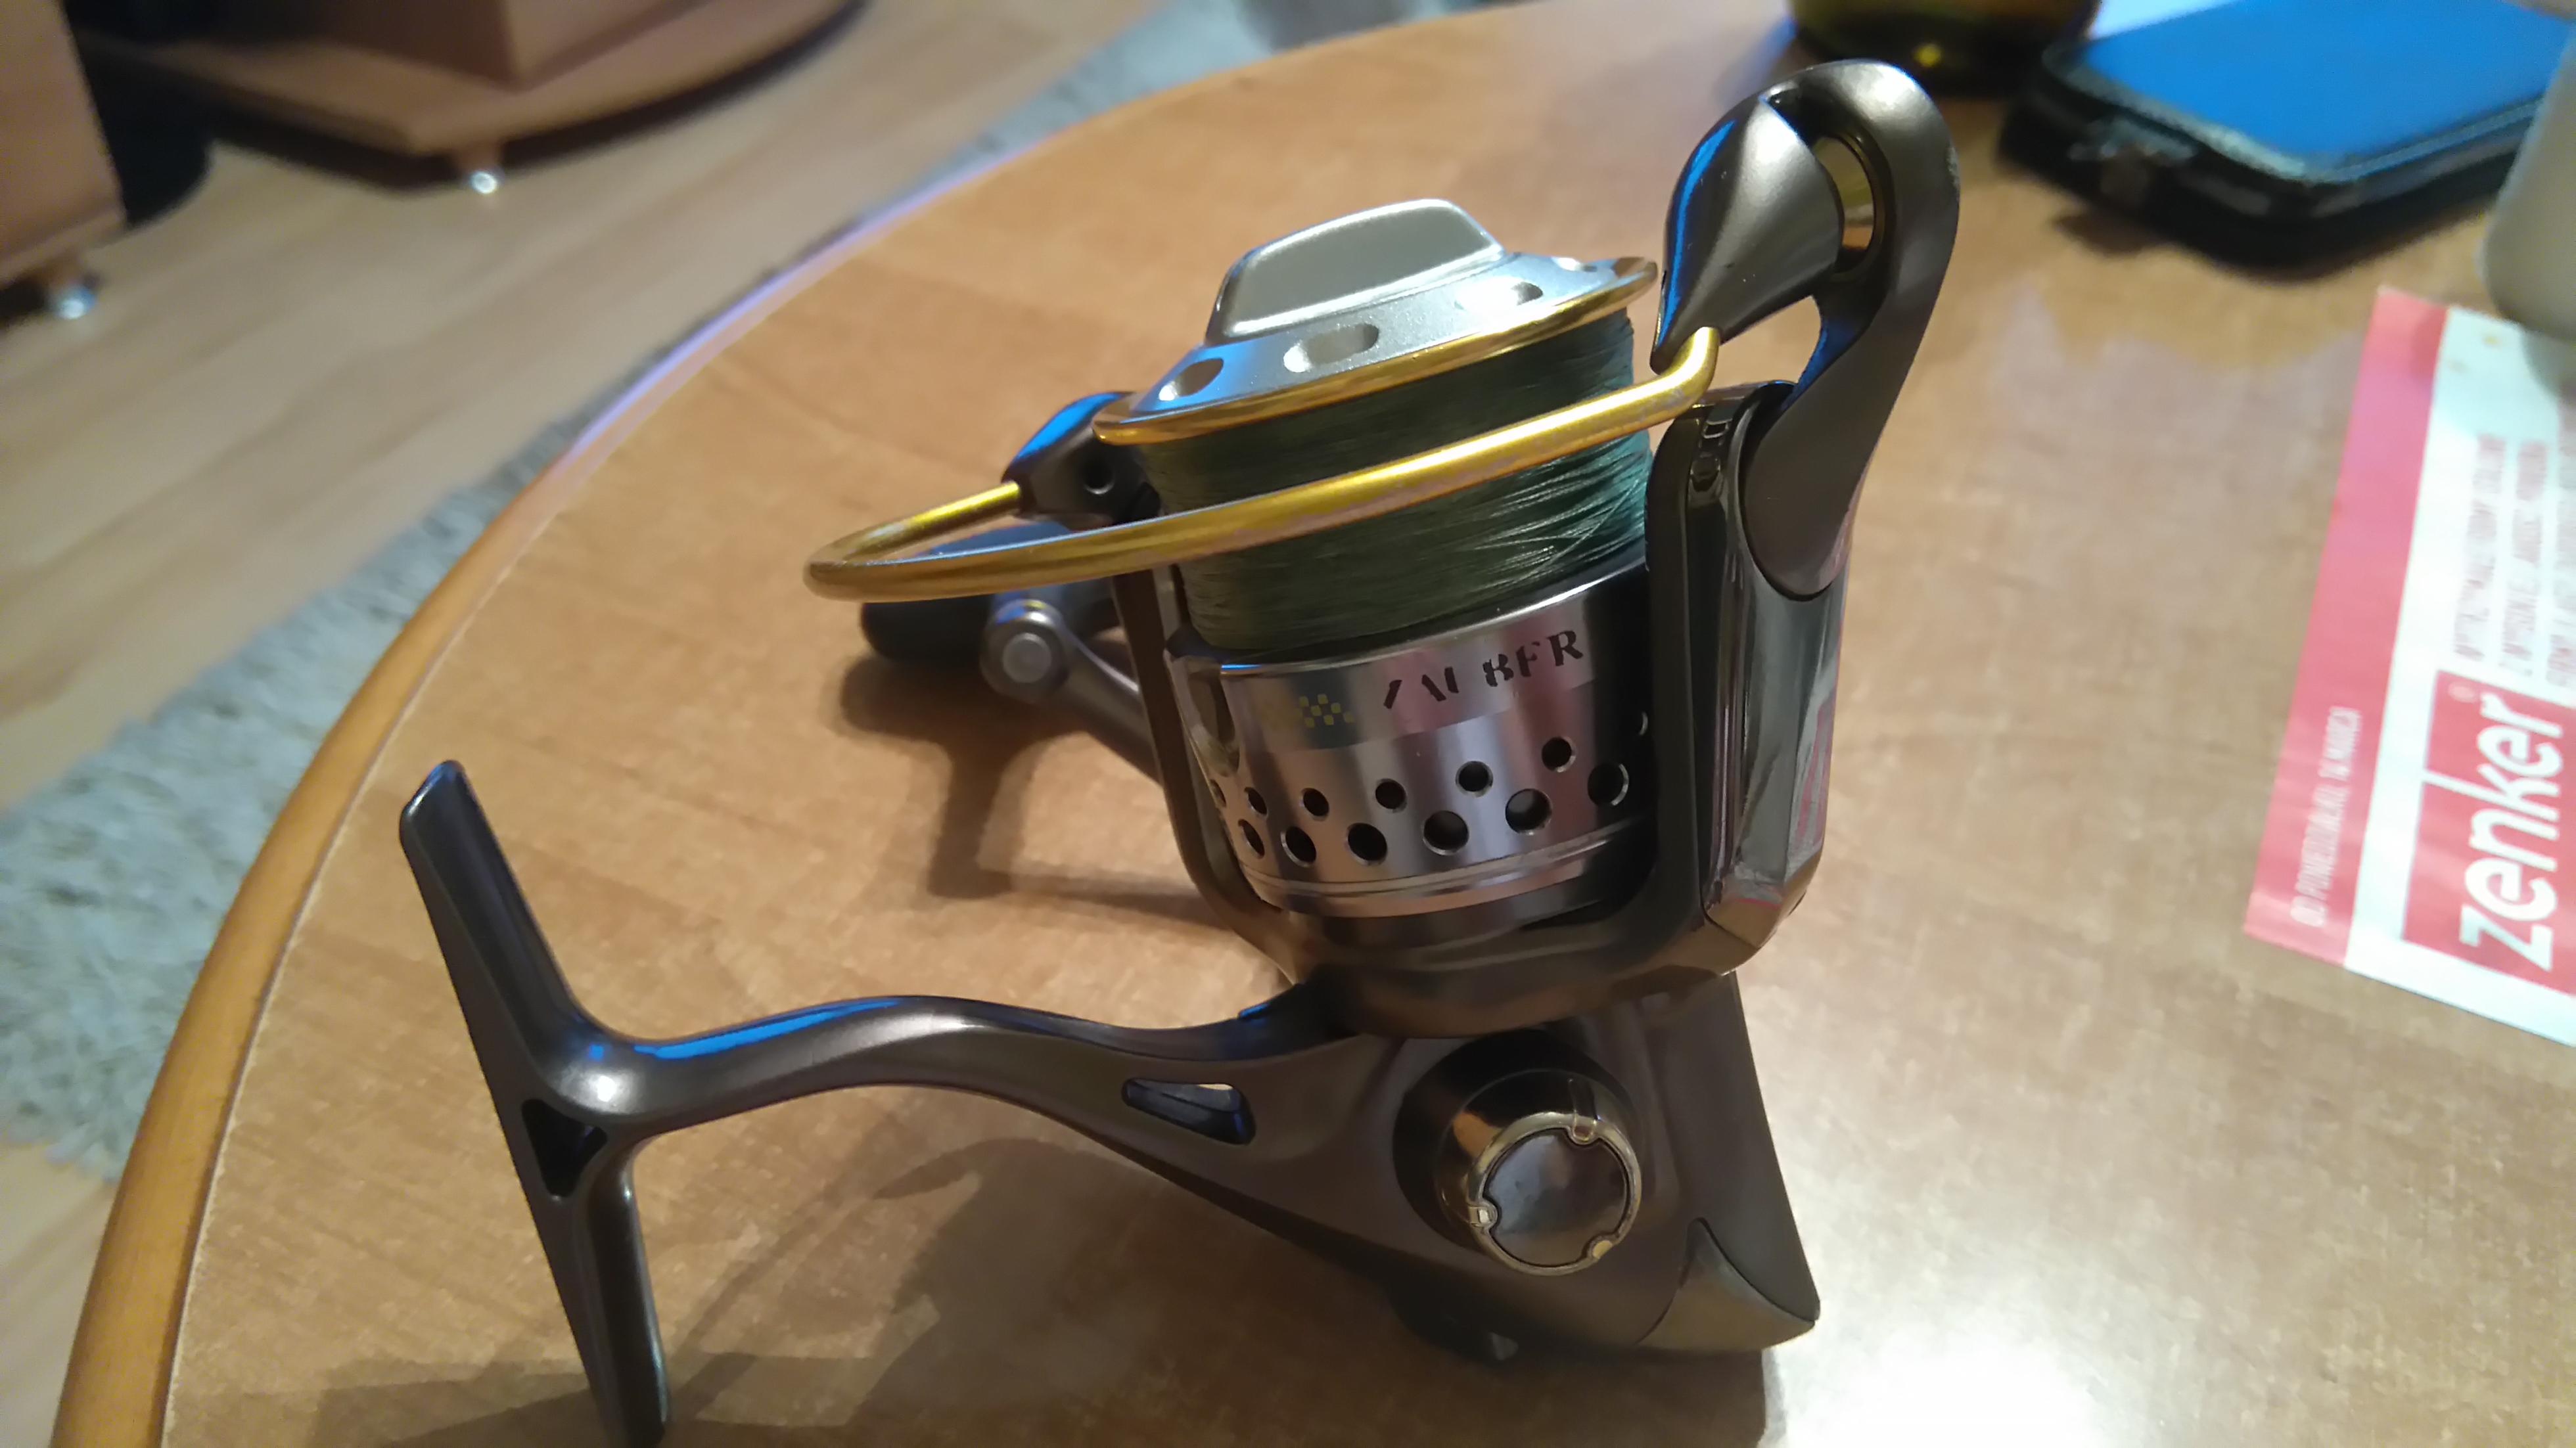 pikefinder.pl/upload_img/82534_DSC_0345.JPG